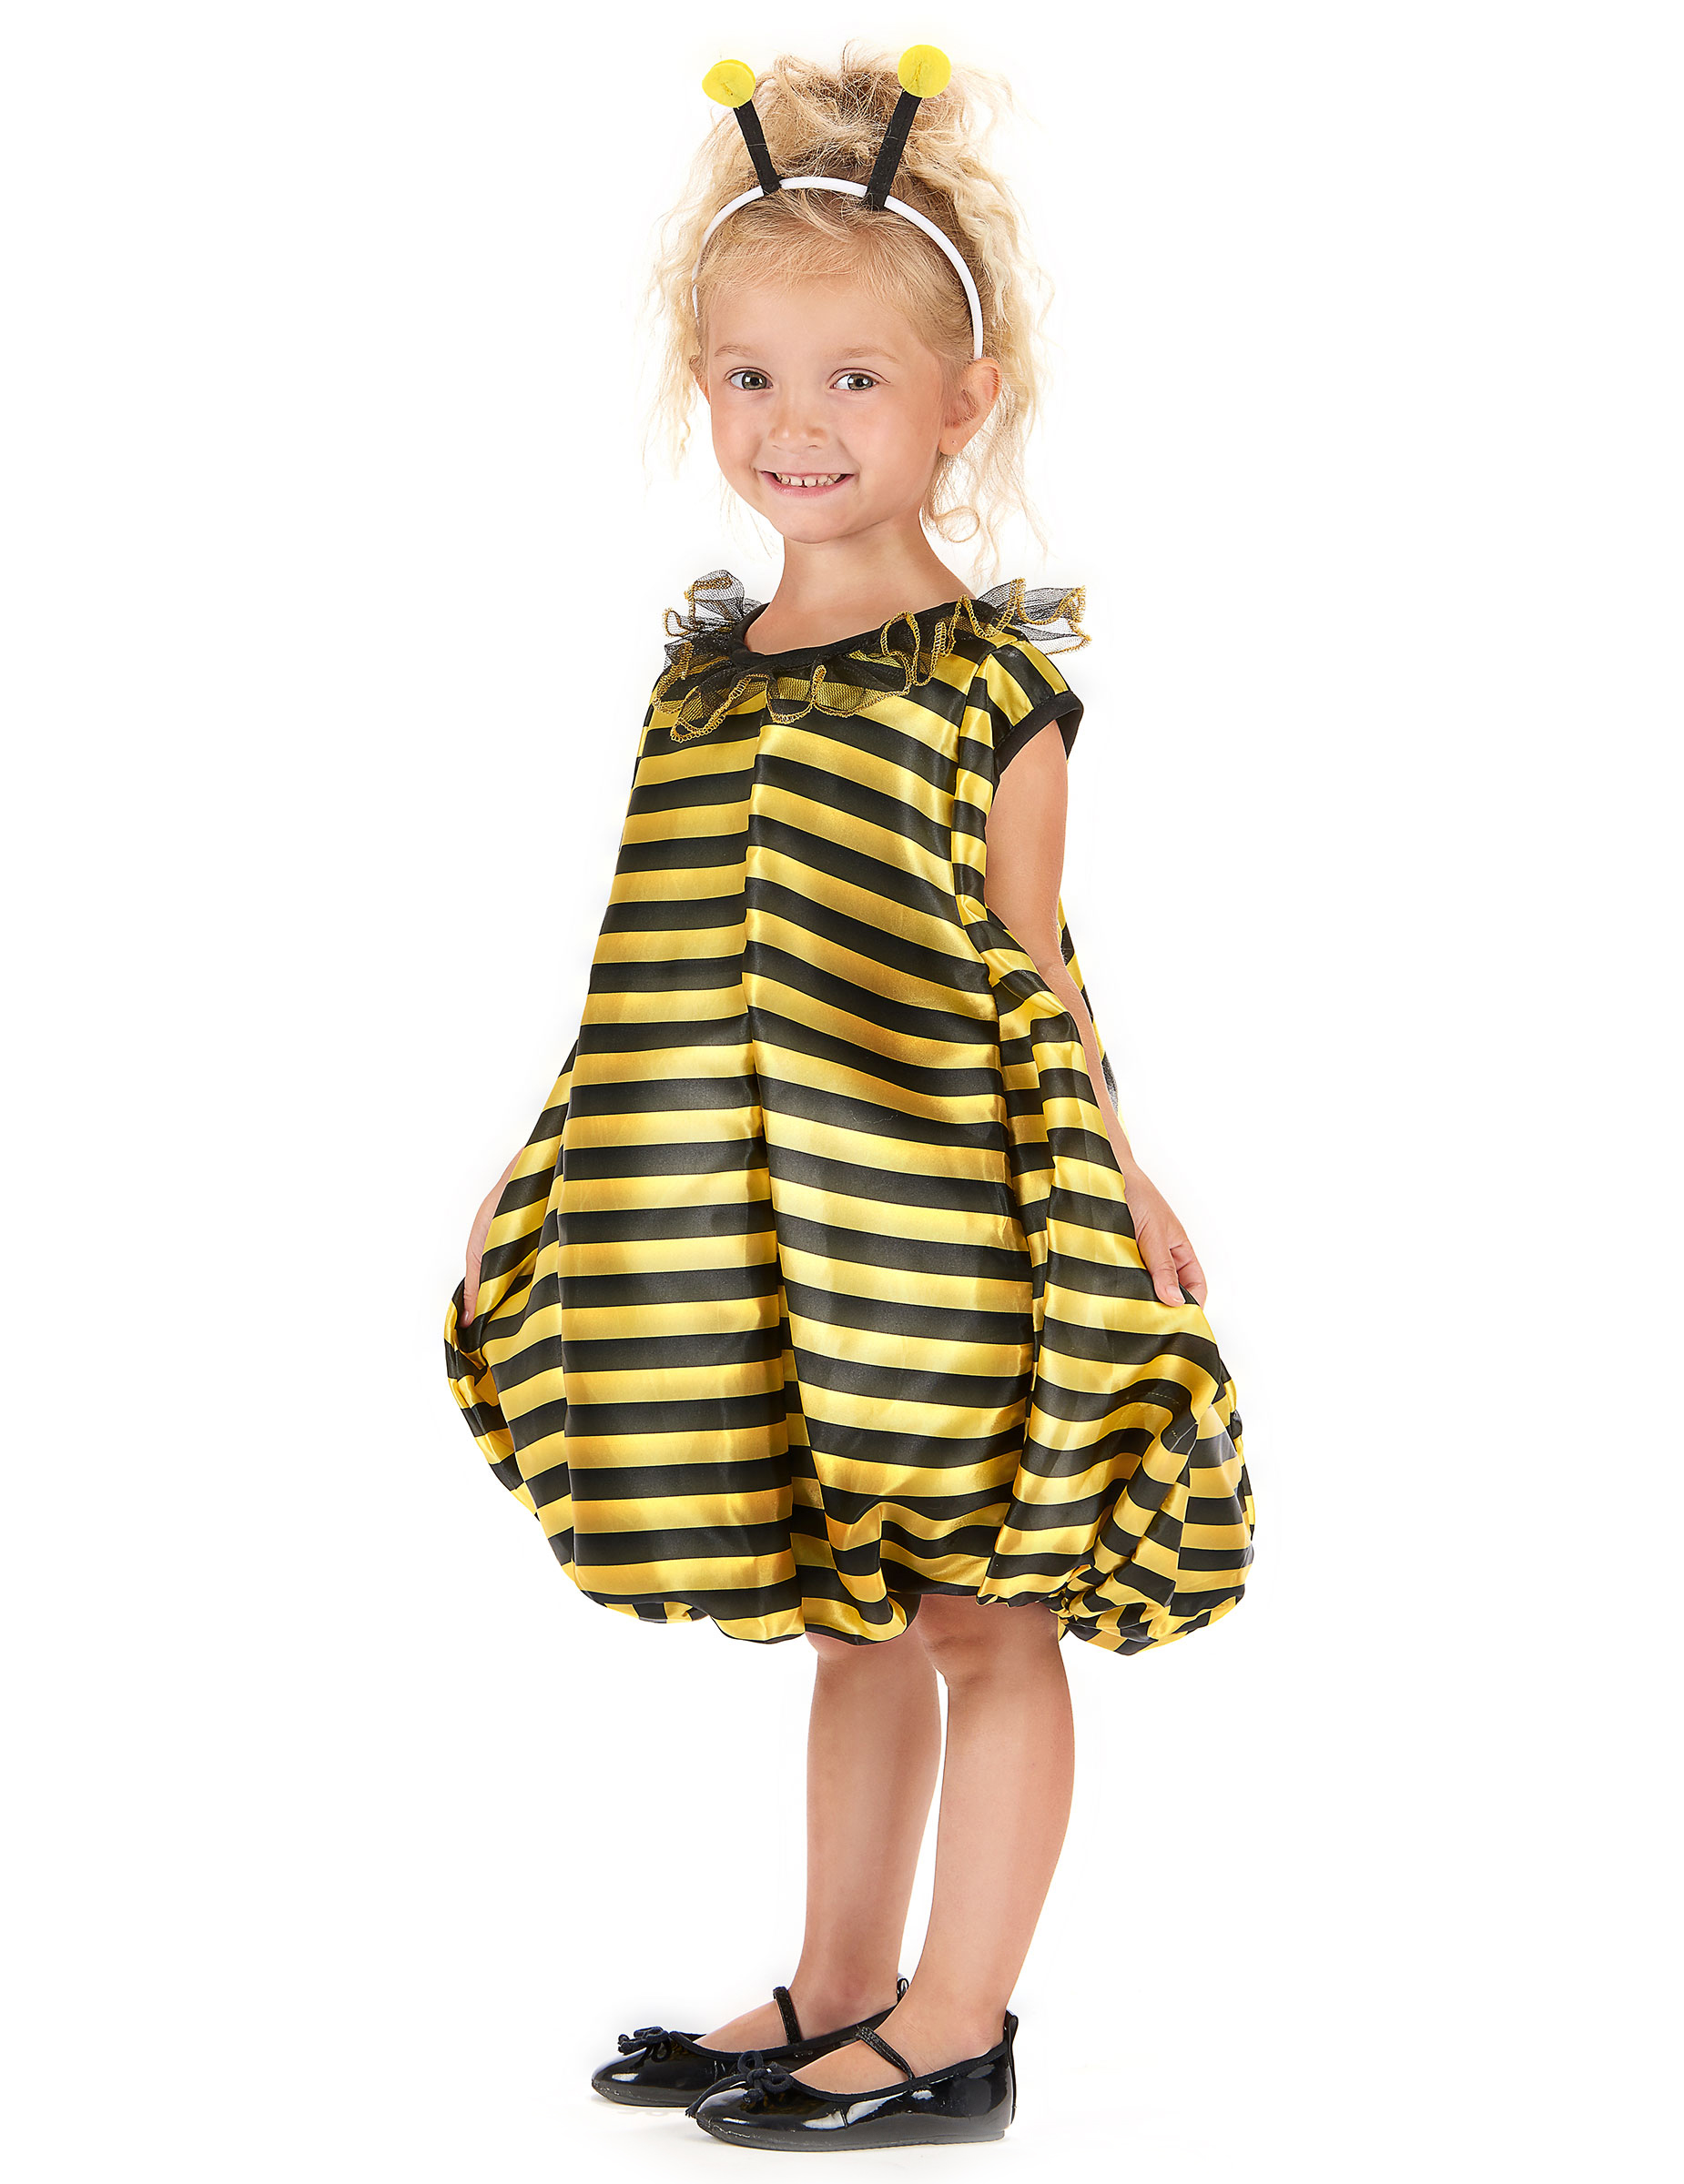 e44cfe856aea1 Déguisement bouffant abeille fille   Deguise-toi